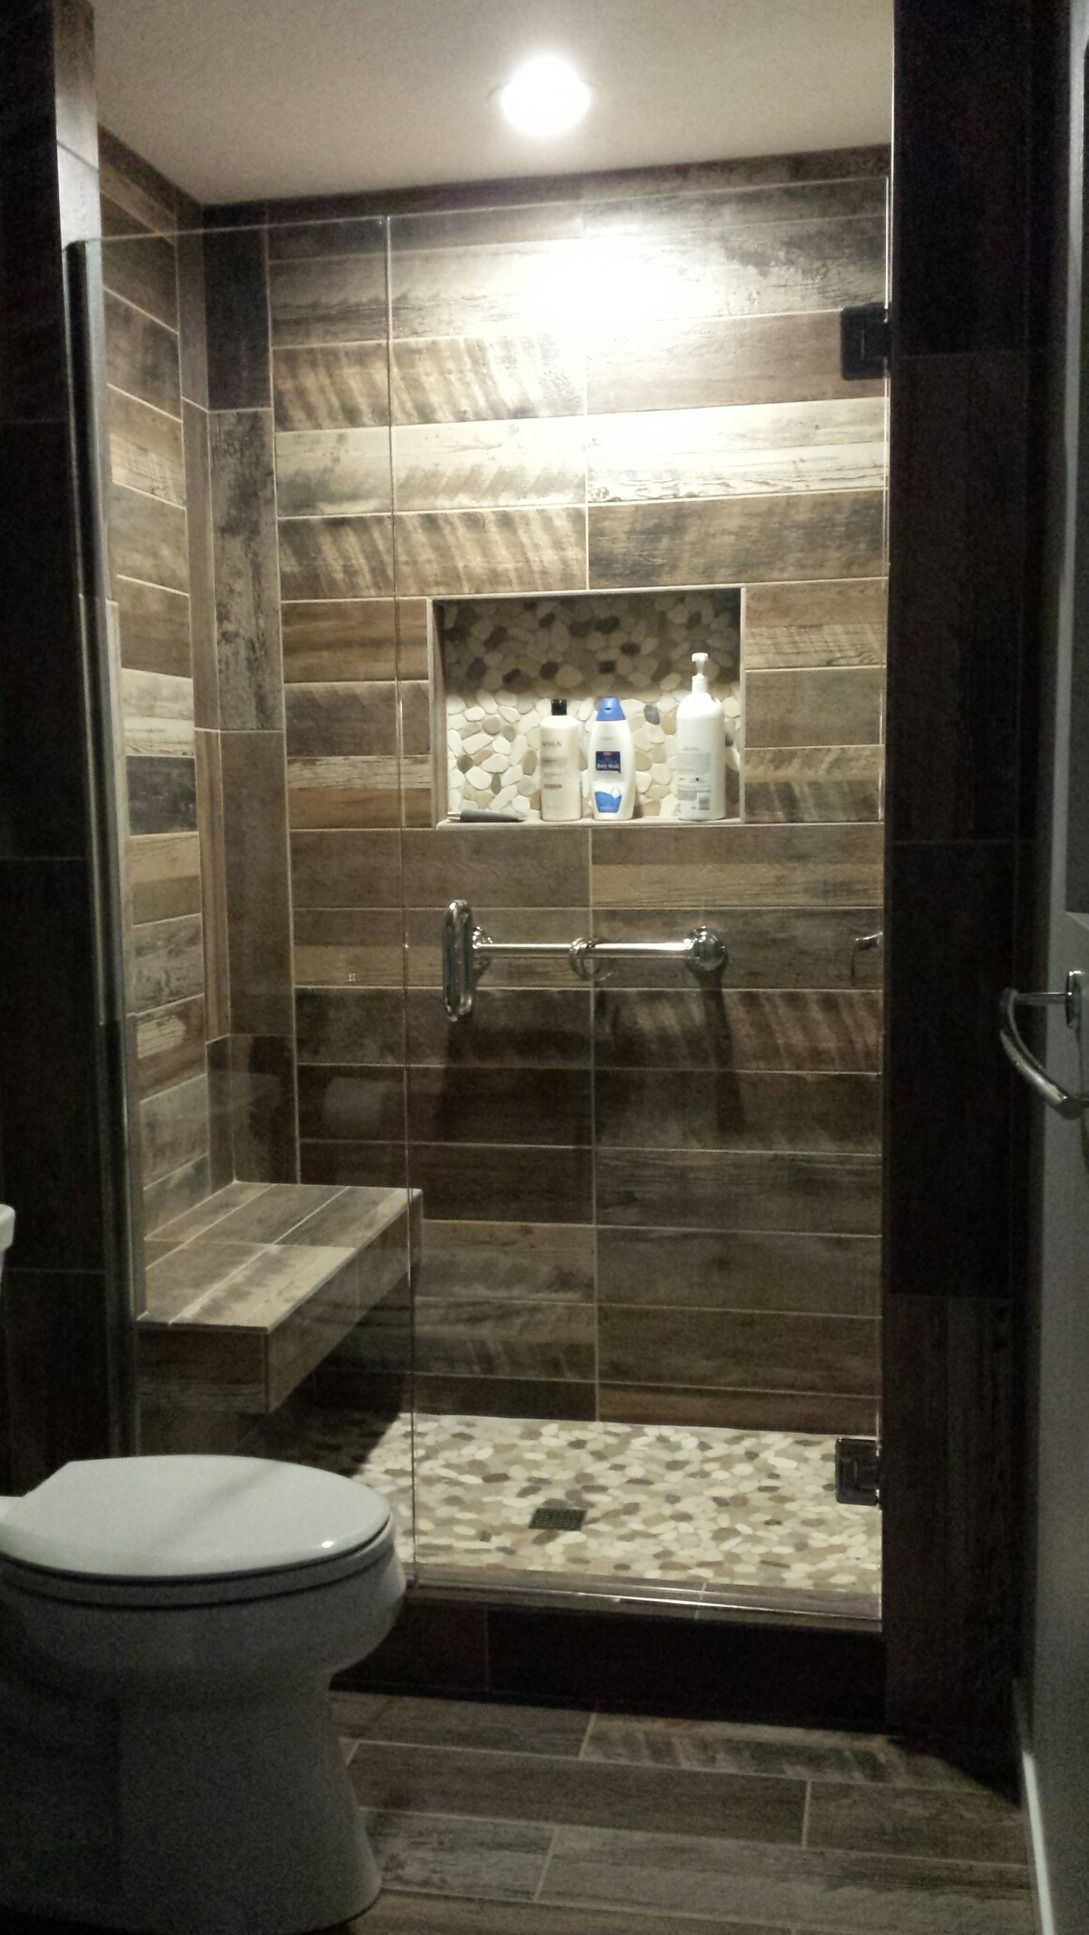 Kennewick Wa Bathroom Remodel Custom Walk In Shower With Wood Plank Look Tile Walls And N Budget Bathroom Remodel Tiny House Bathroom Bathroom Remodel Shower